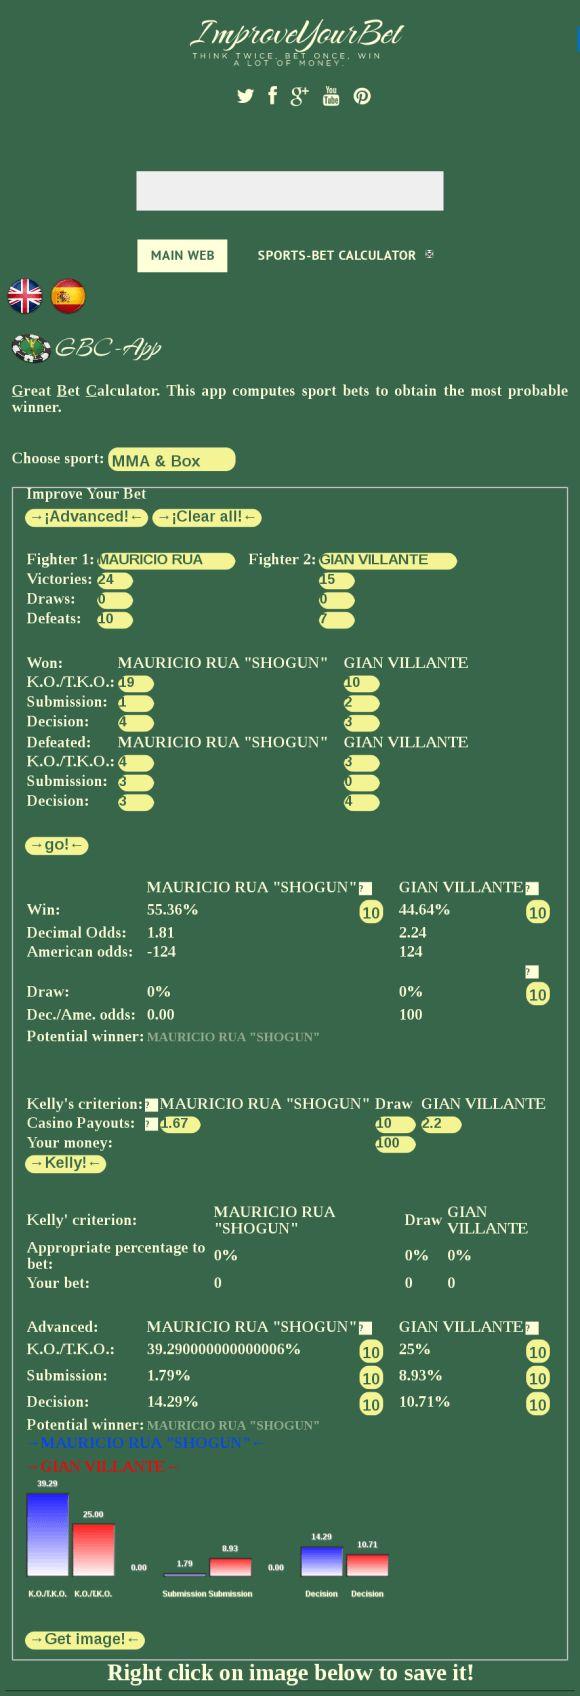 UFC fight night 106 forecast predictions and picks MAURICIO RUA SHOGUN Vs GIAN VILLANTE